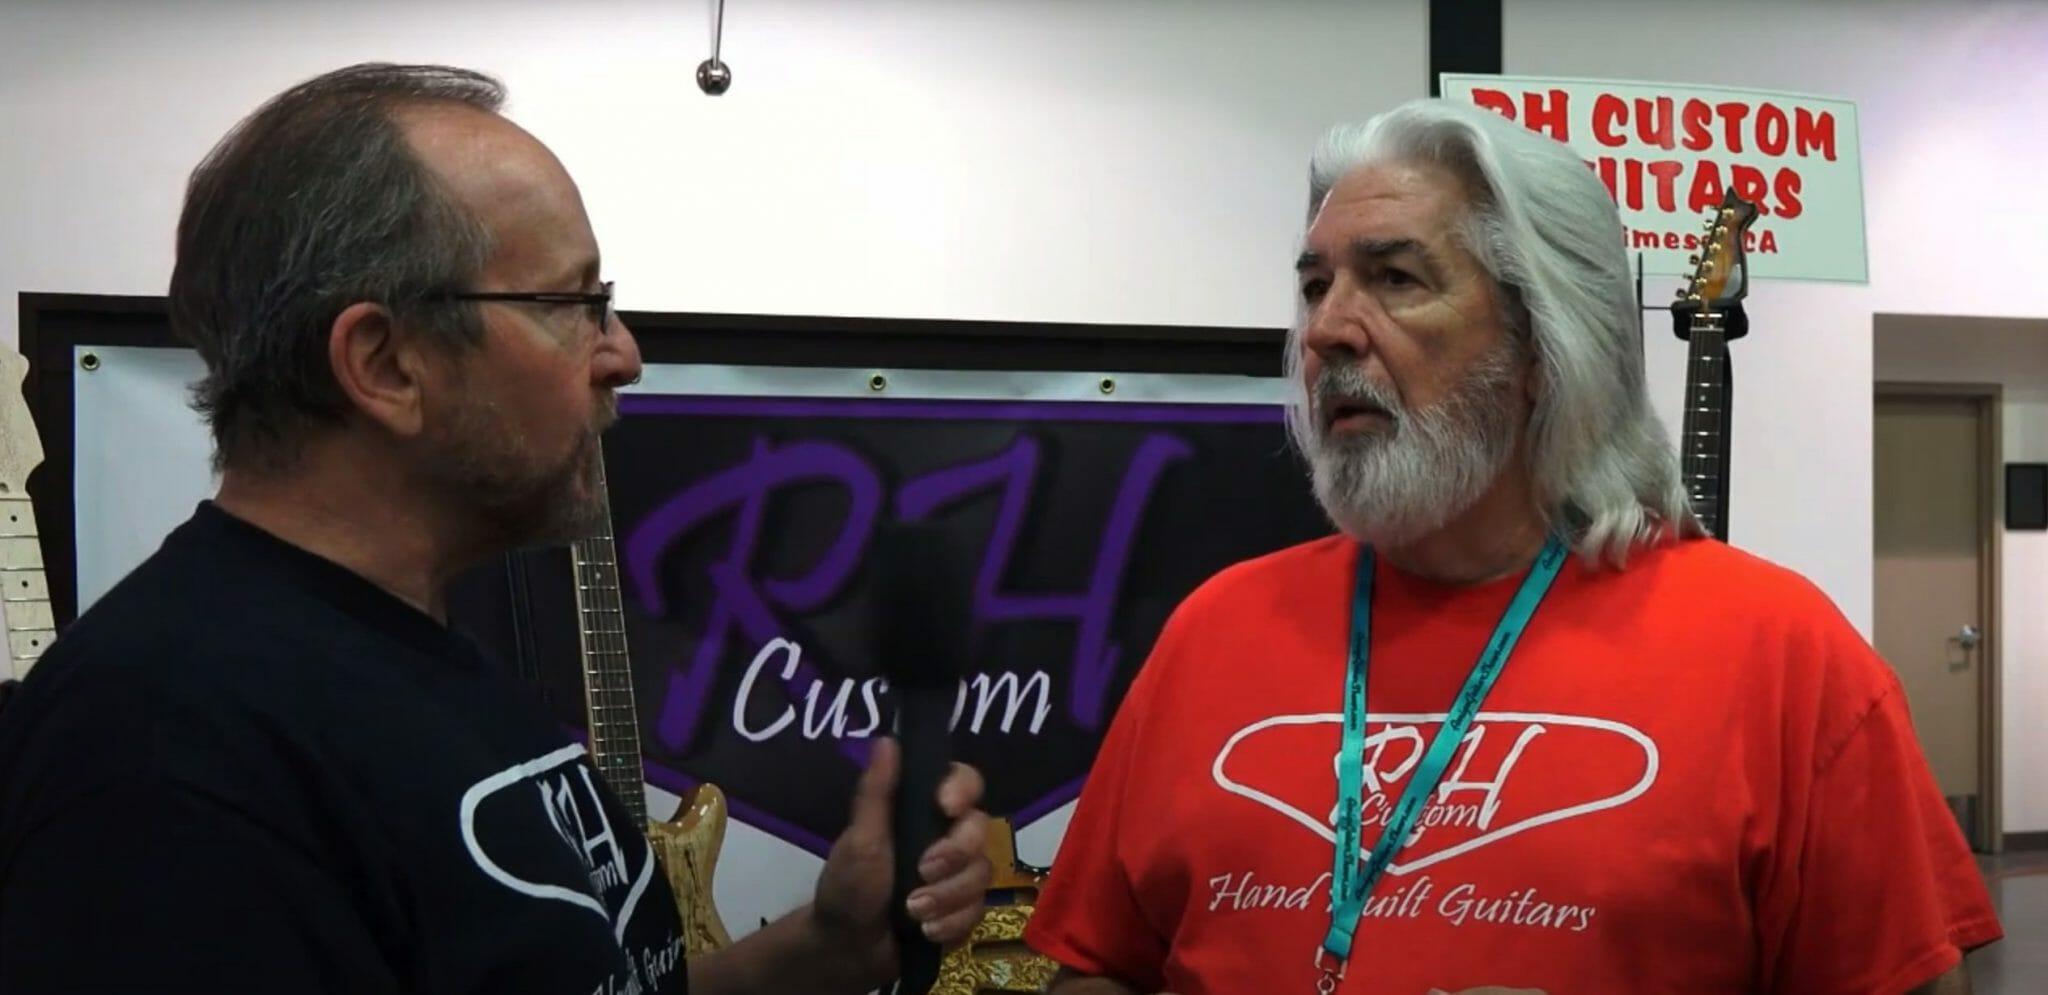 Adventure CEO Insights Interviews RH Custom Founder Rick Harrison